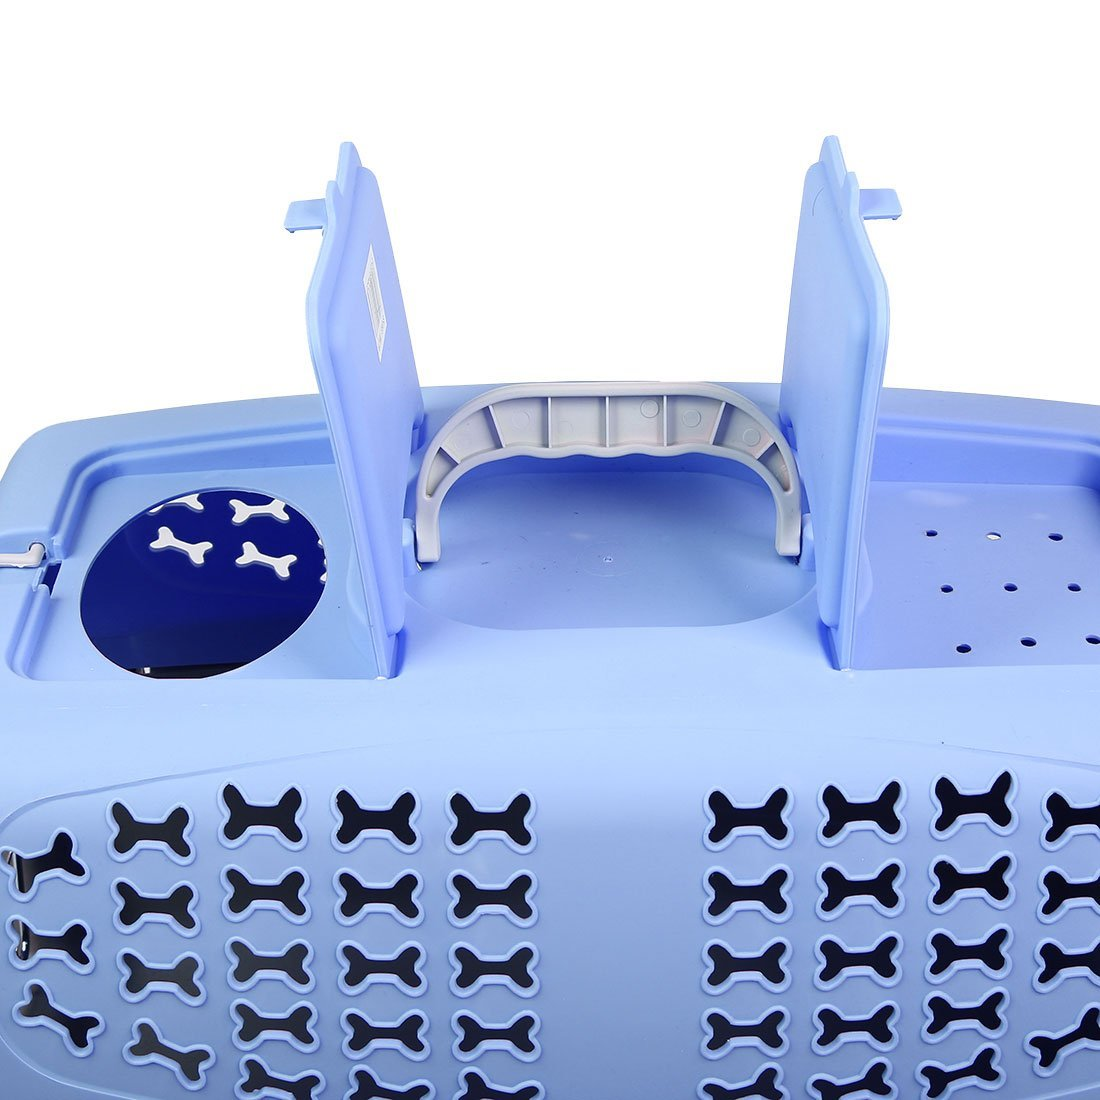 DealMux Plastic Outdoors Travel Meshy Transport Cages Airways Box Pet Carrier 59x38x38cm Blue